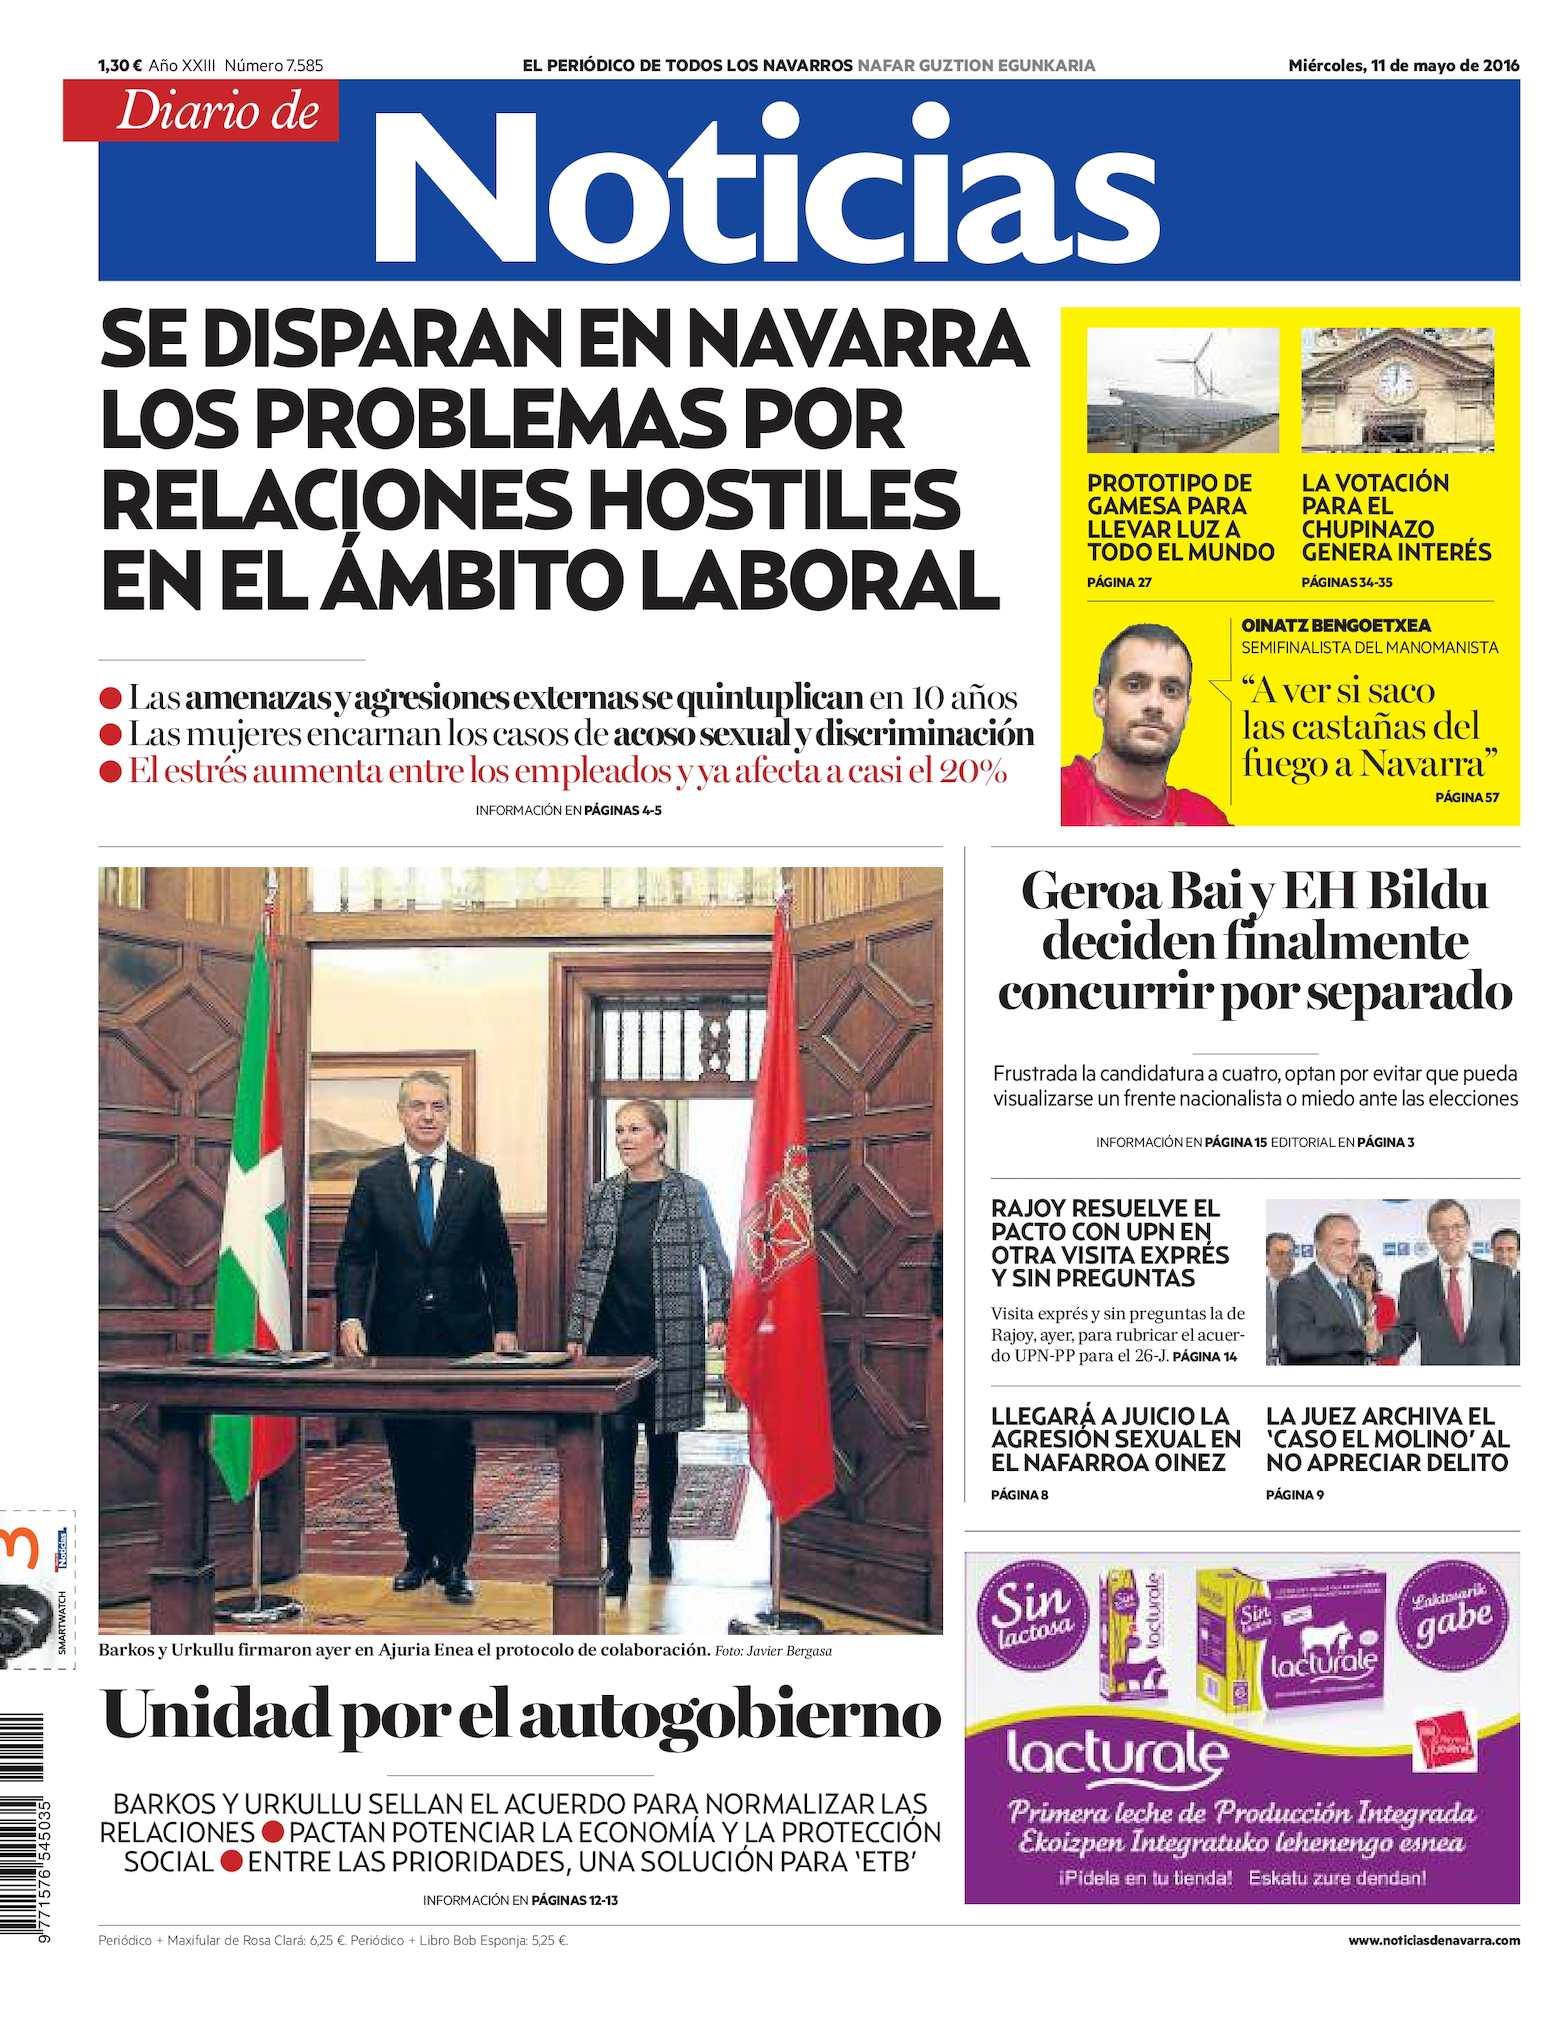 Calaméo - Diario de Noticias 20160511 7588f24c2b2